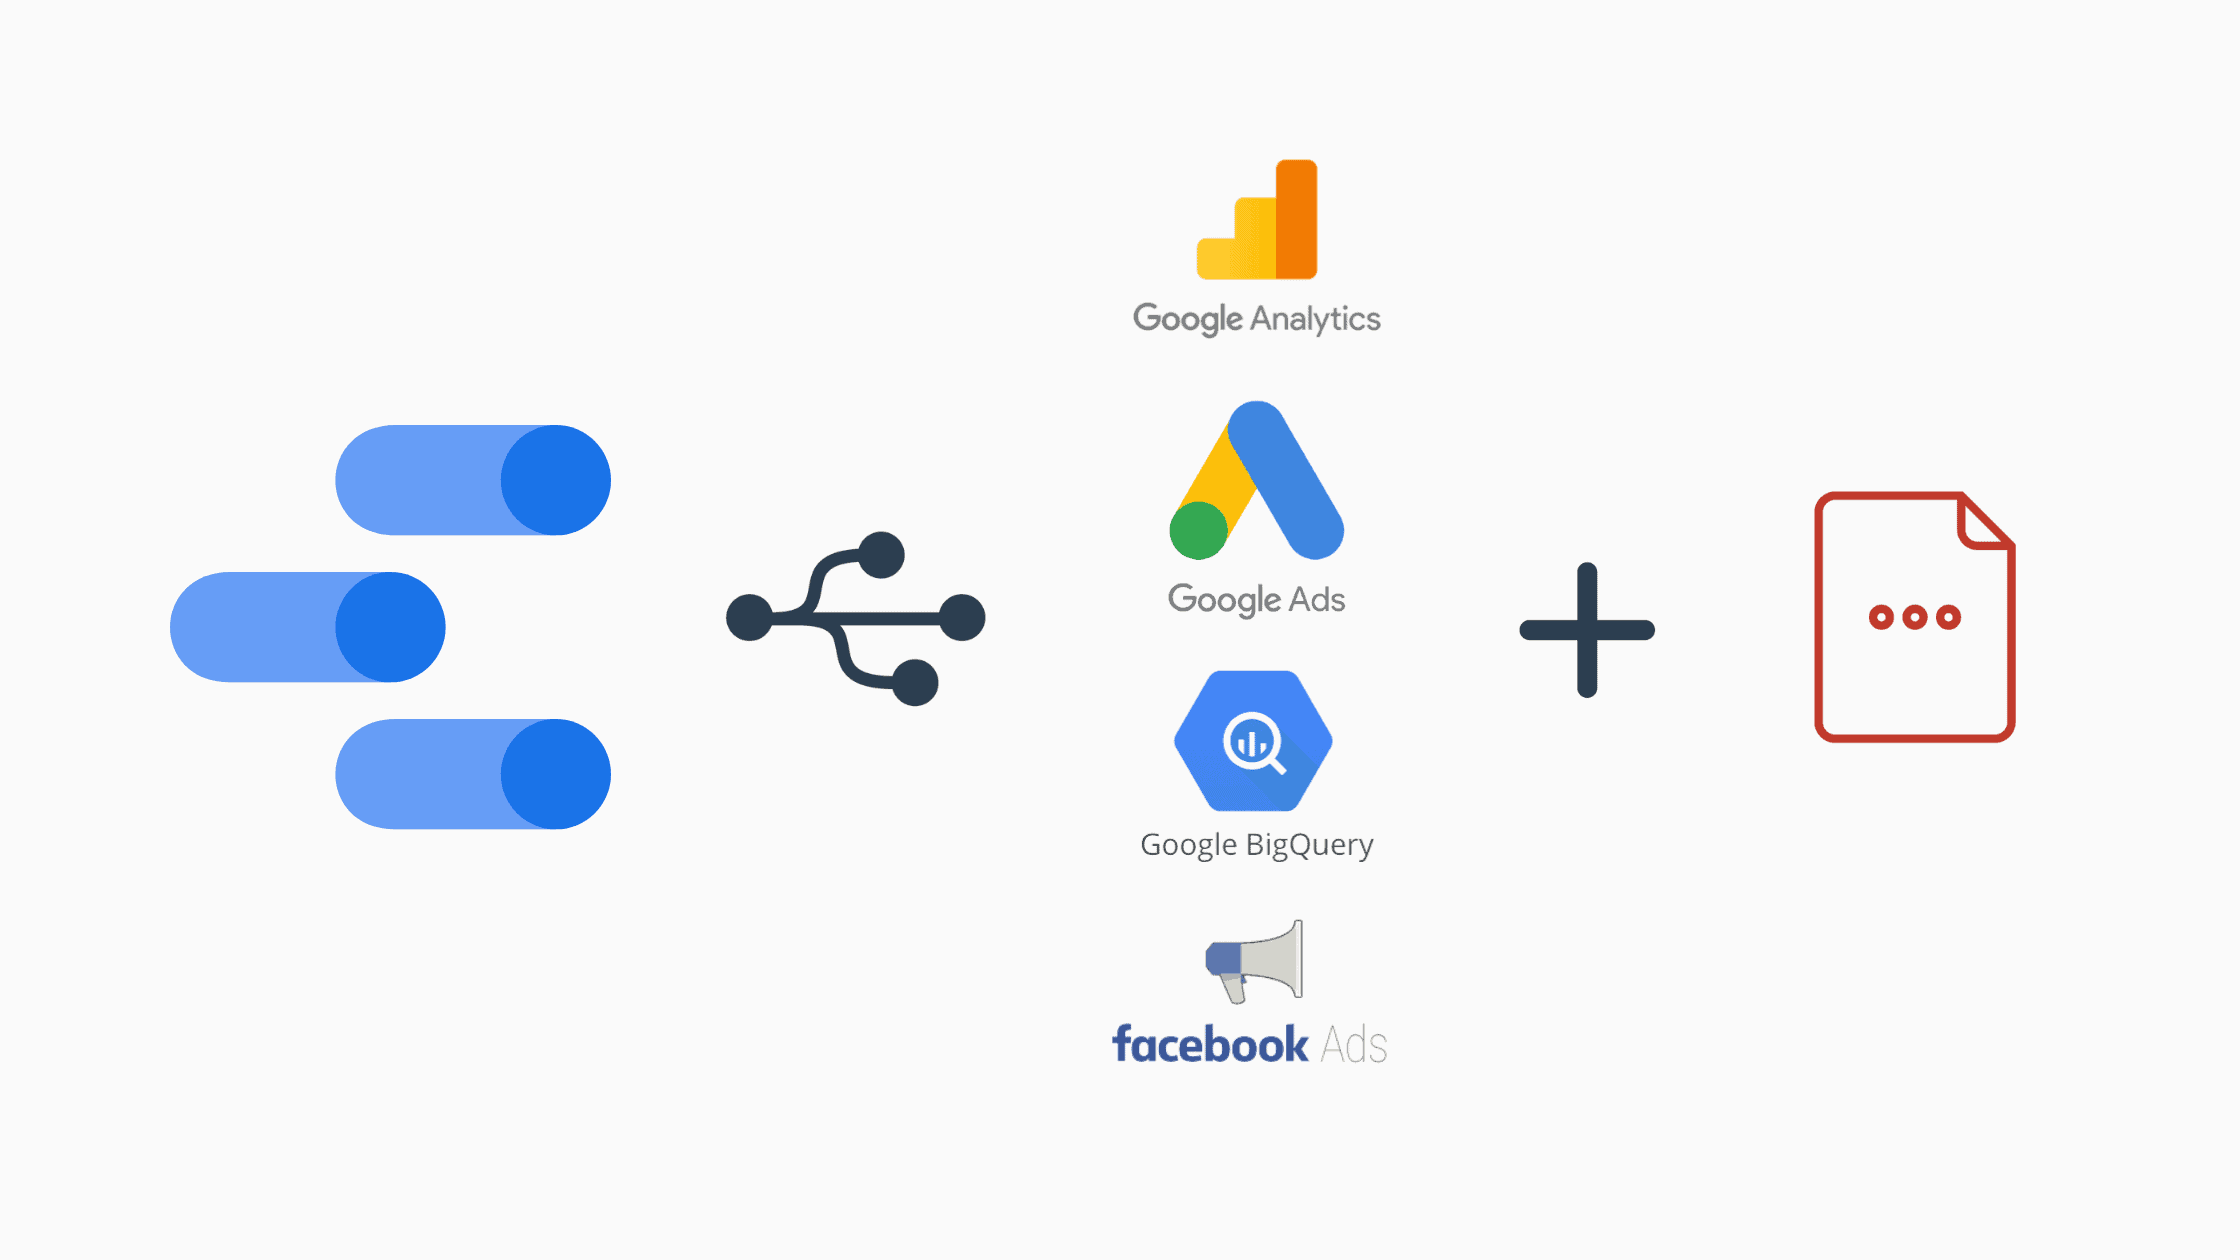 Google Data Studio can connect multiple data sources like Google Analytics, Google Ads, etc.